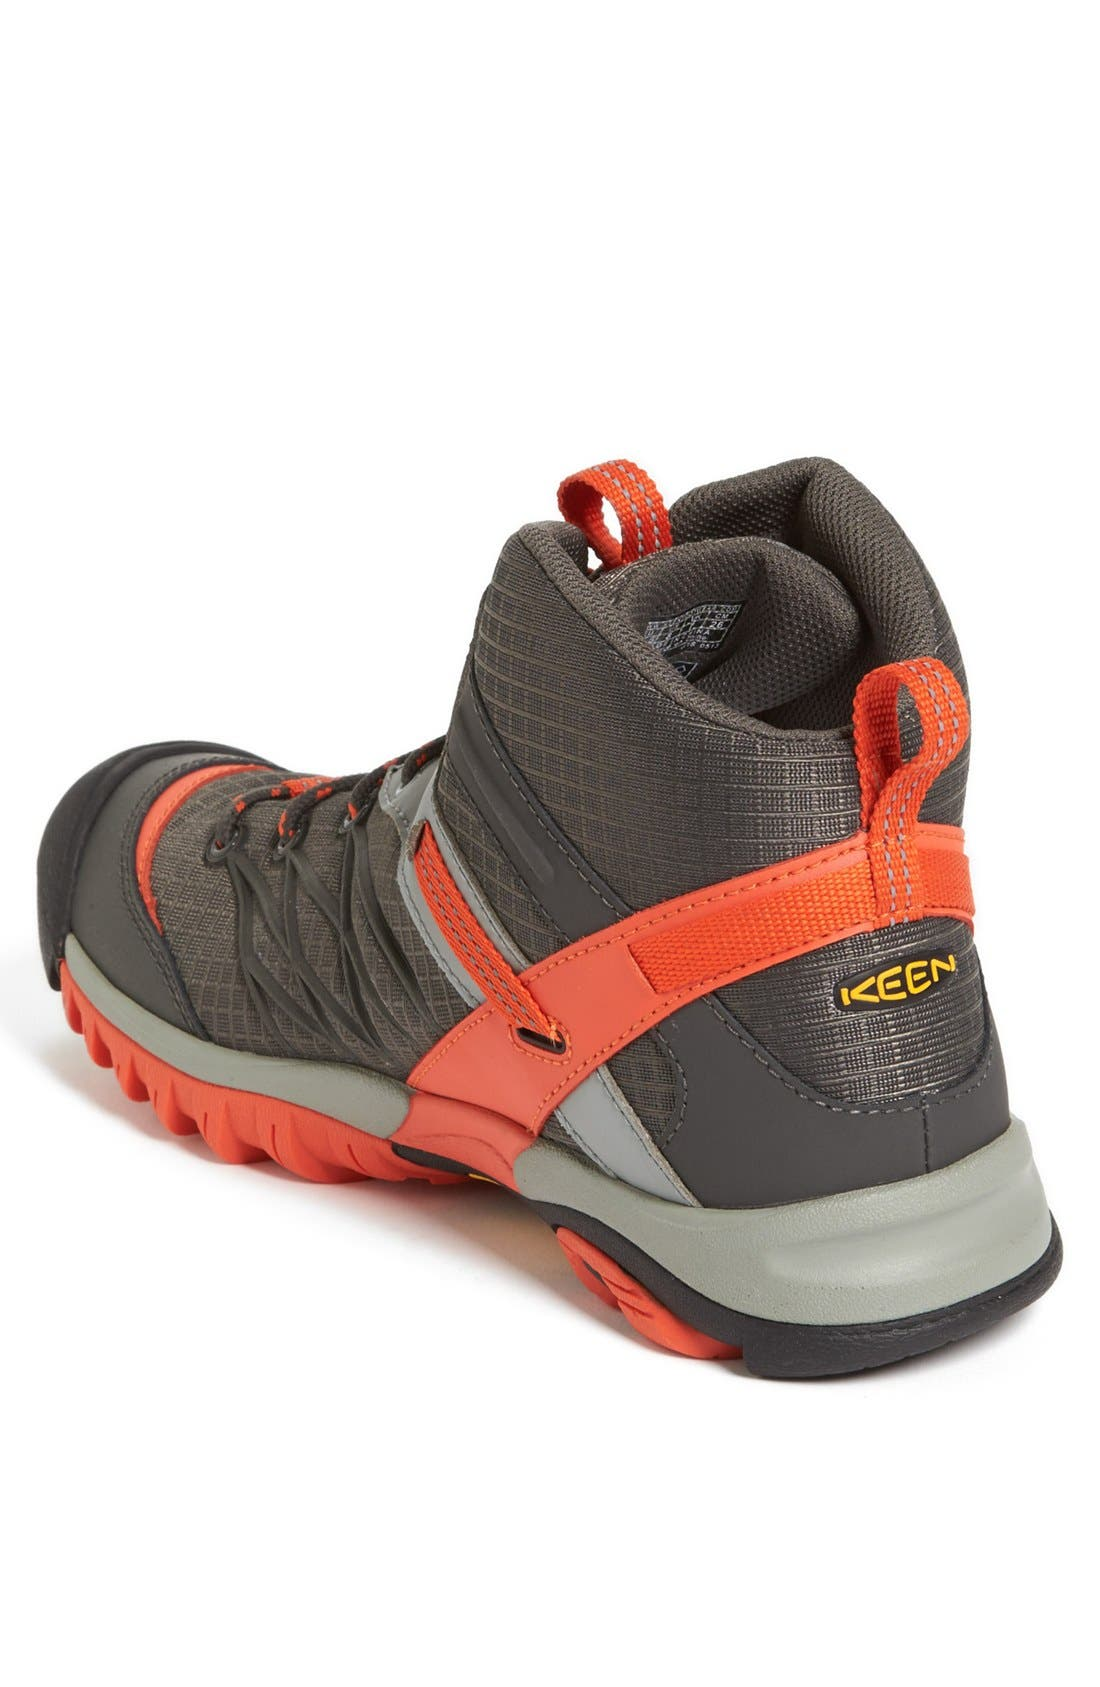 Alternate Image 2  - Keen 'Marshall Mid WP' Hiking Boot (Men)